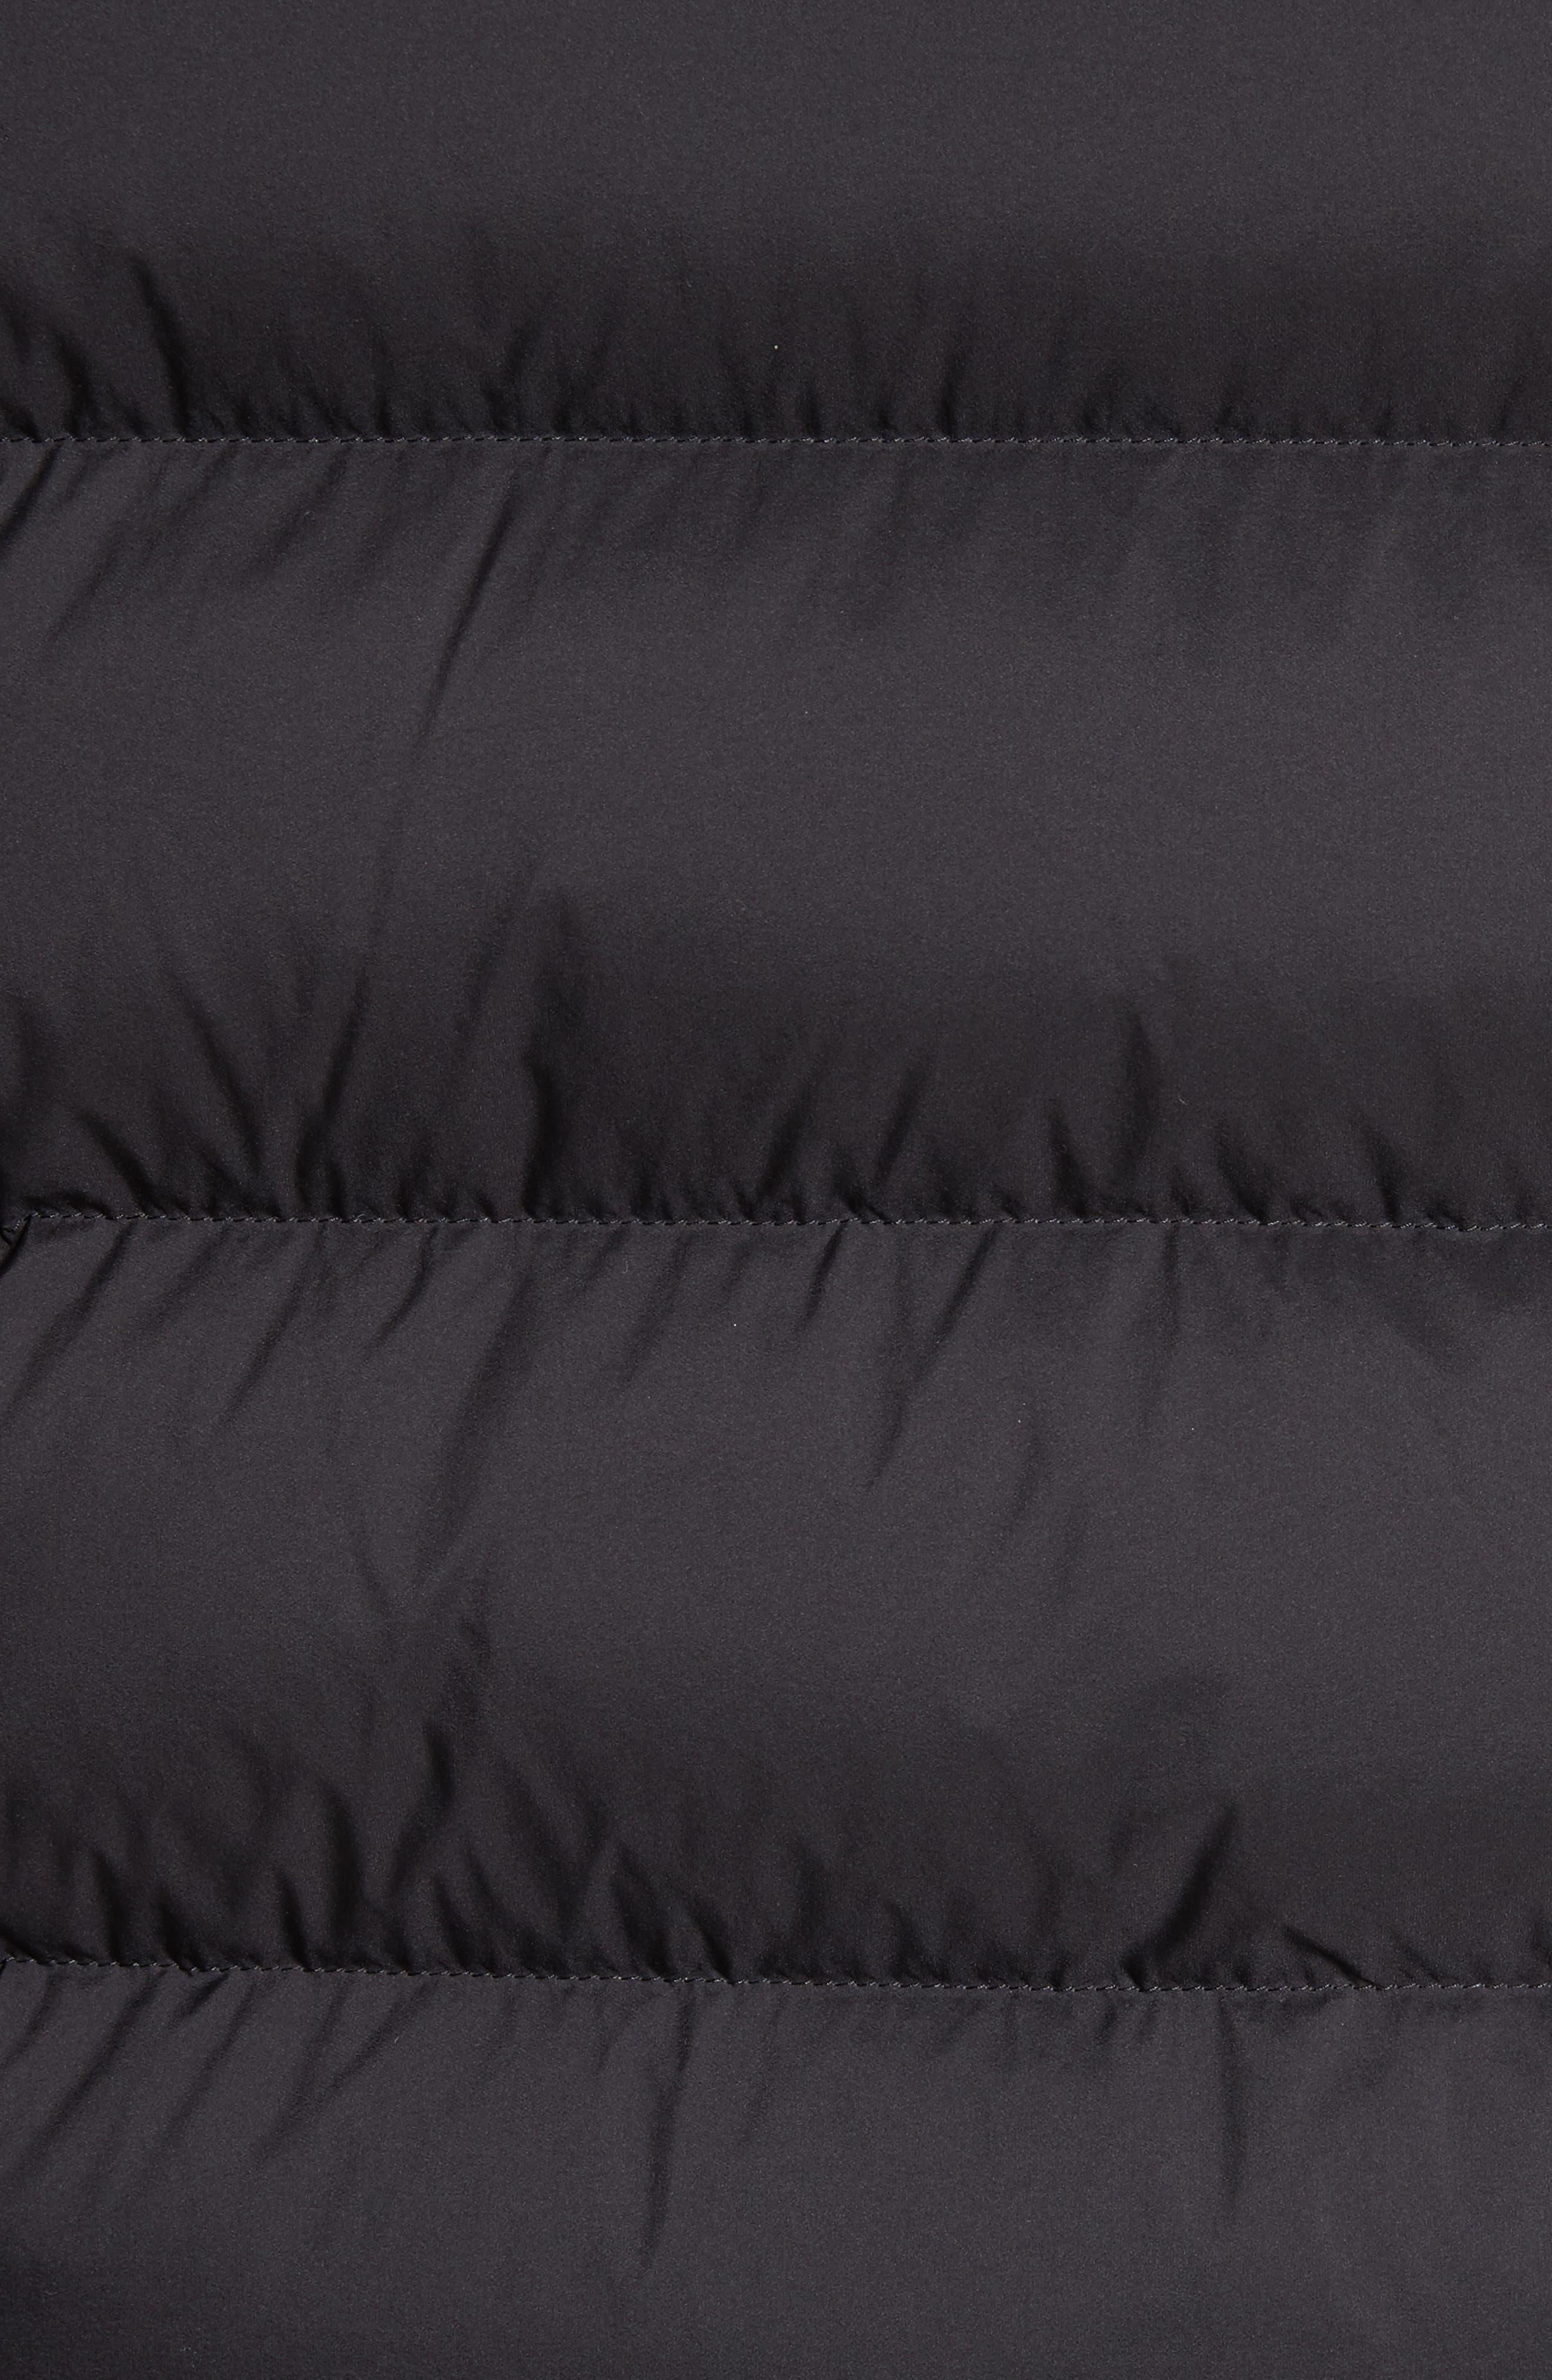 Hartley Convertible Down Jacket,                             Alternate thumbnail 5, color,                             Black